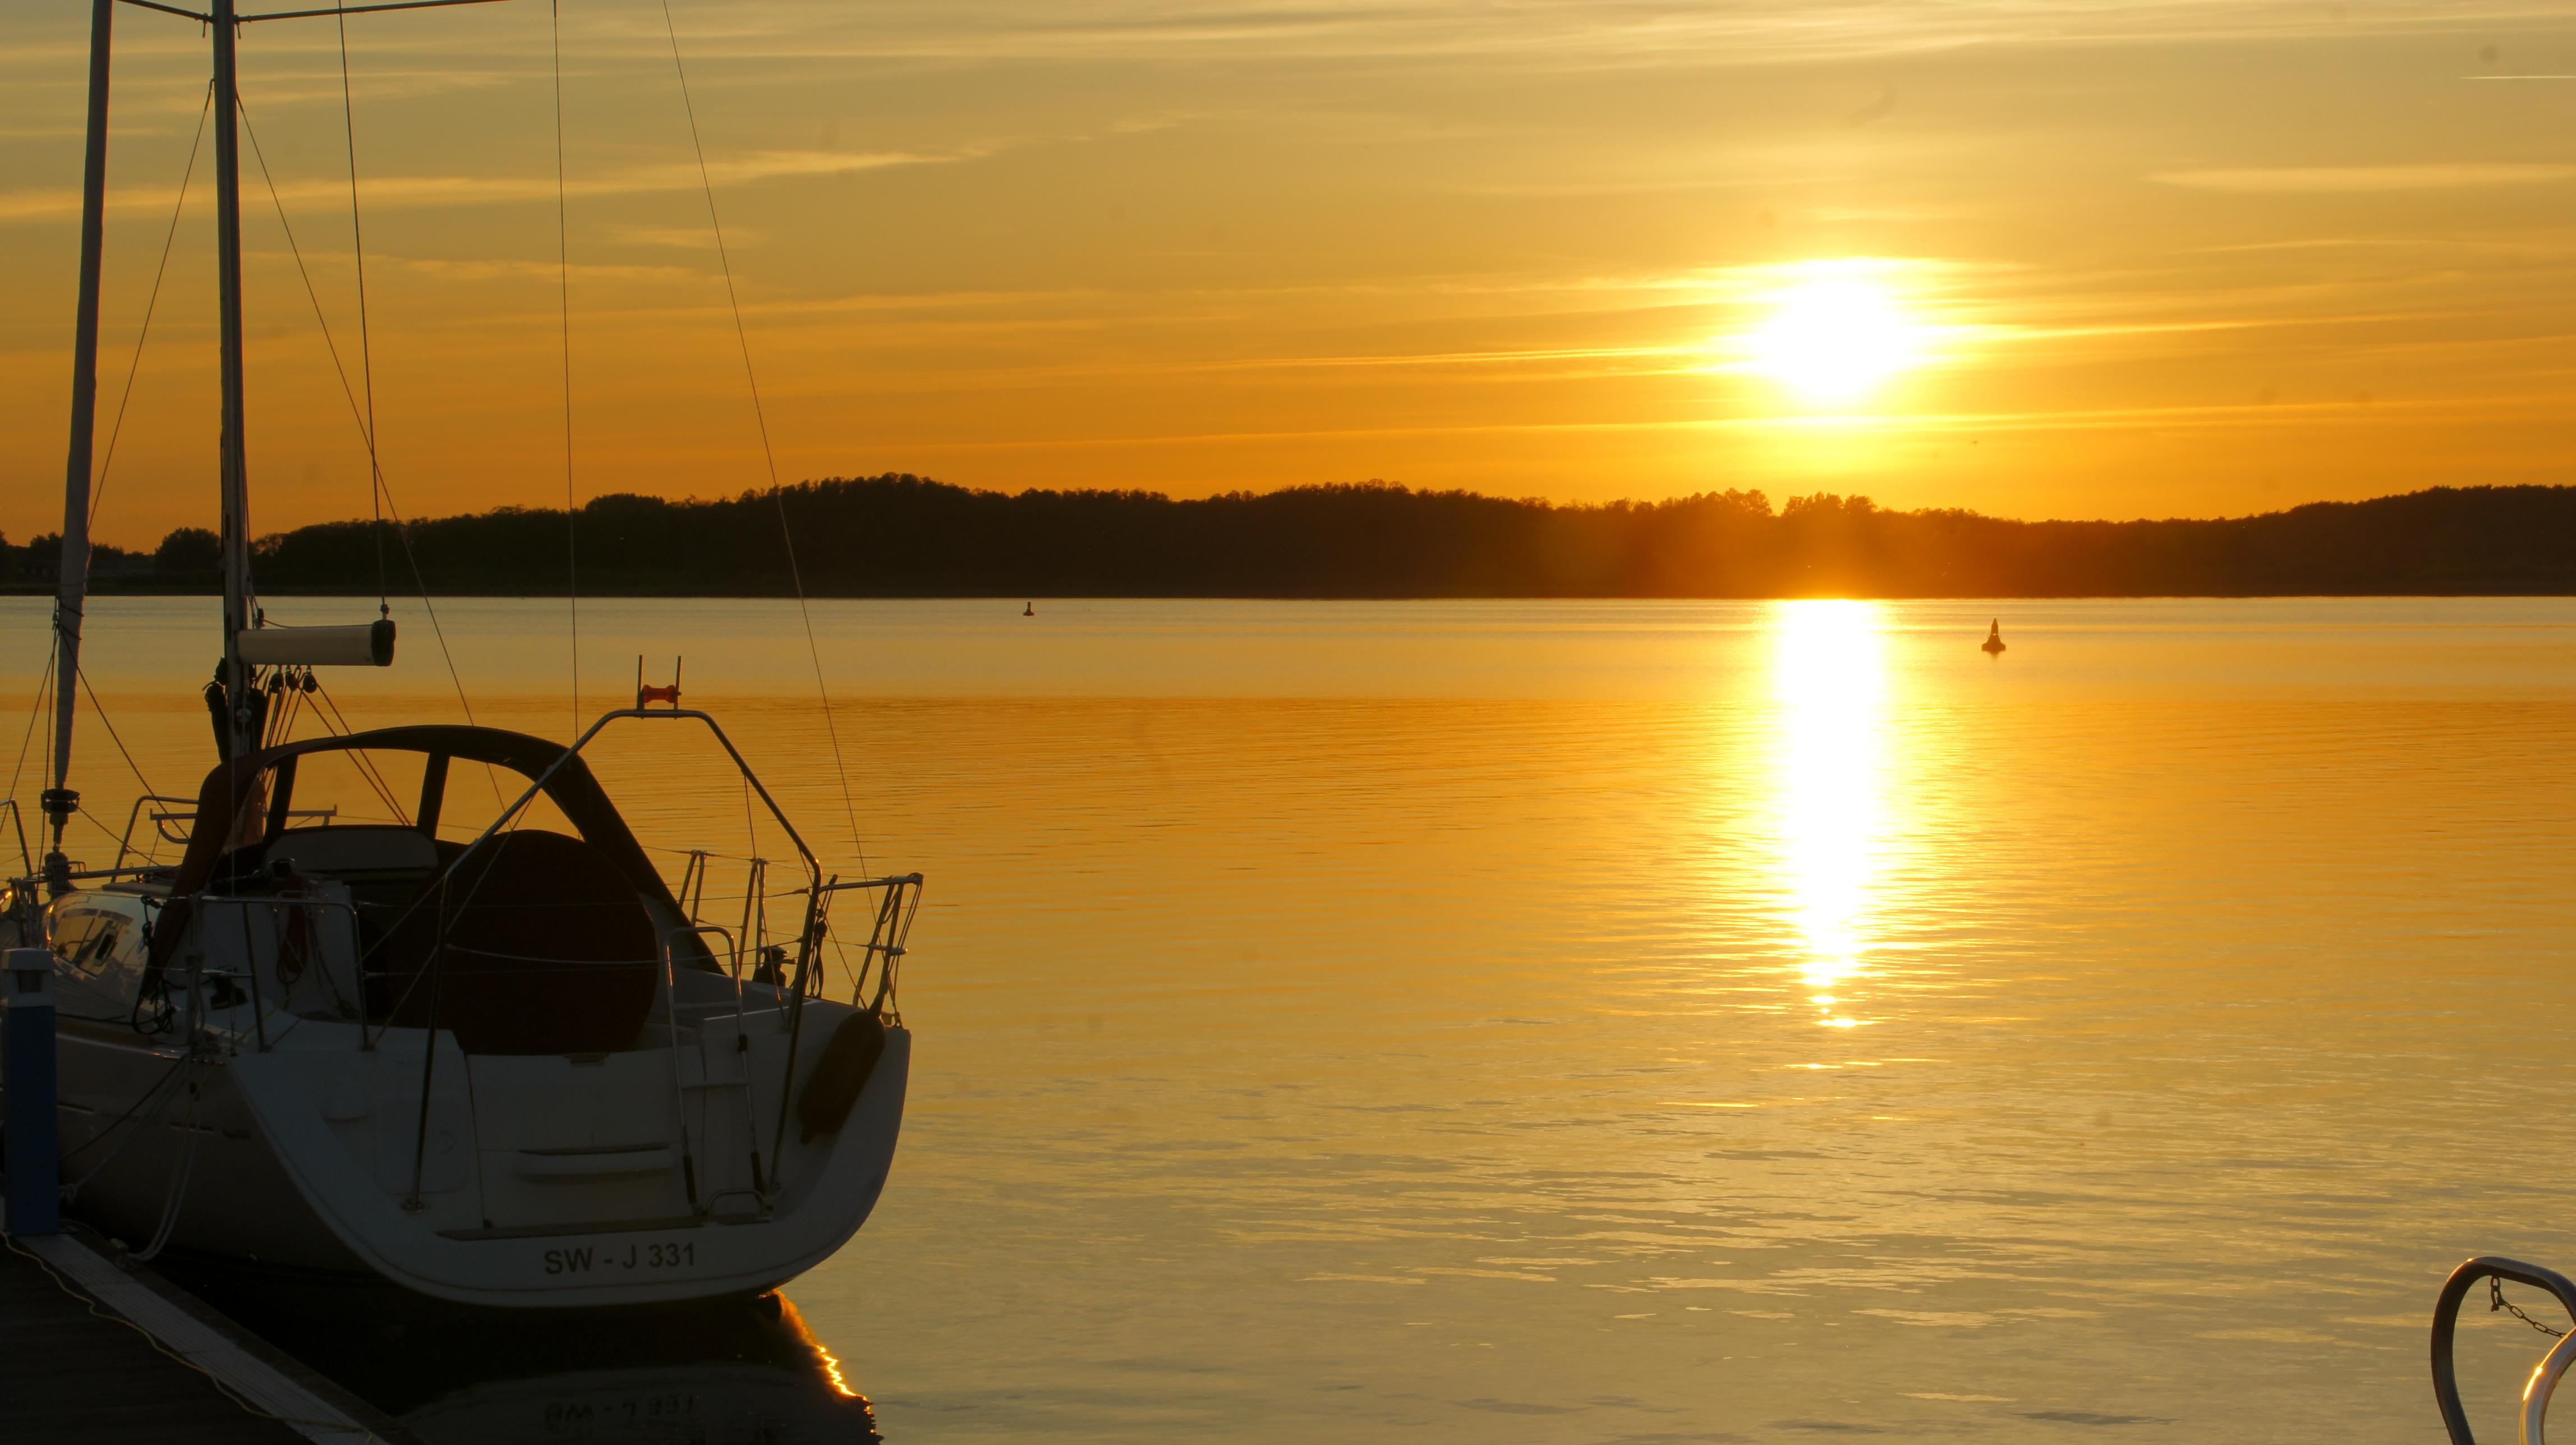 Heiligenhafen-Grossenbrode (Mola Yachting)